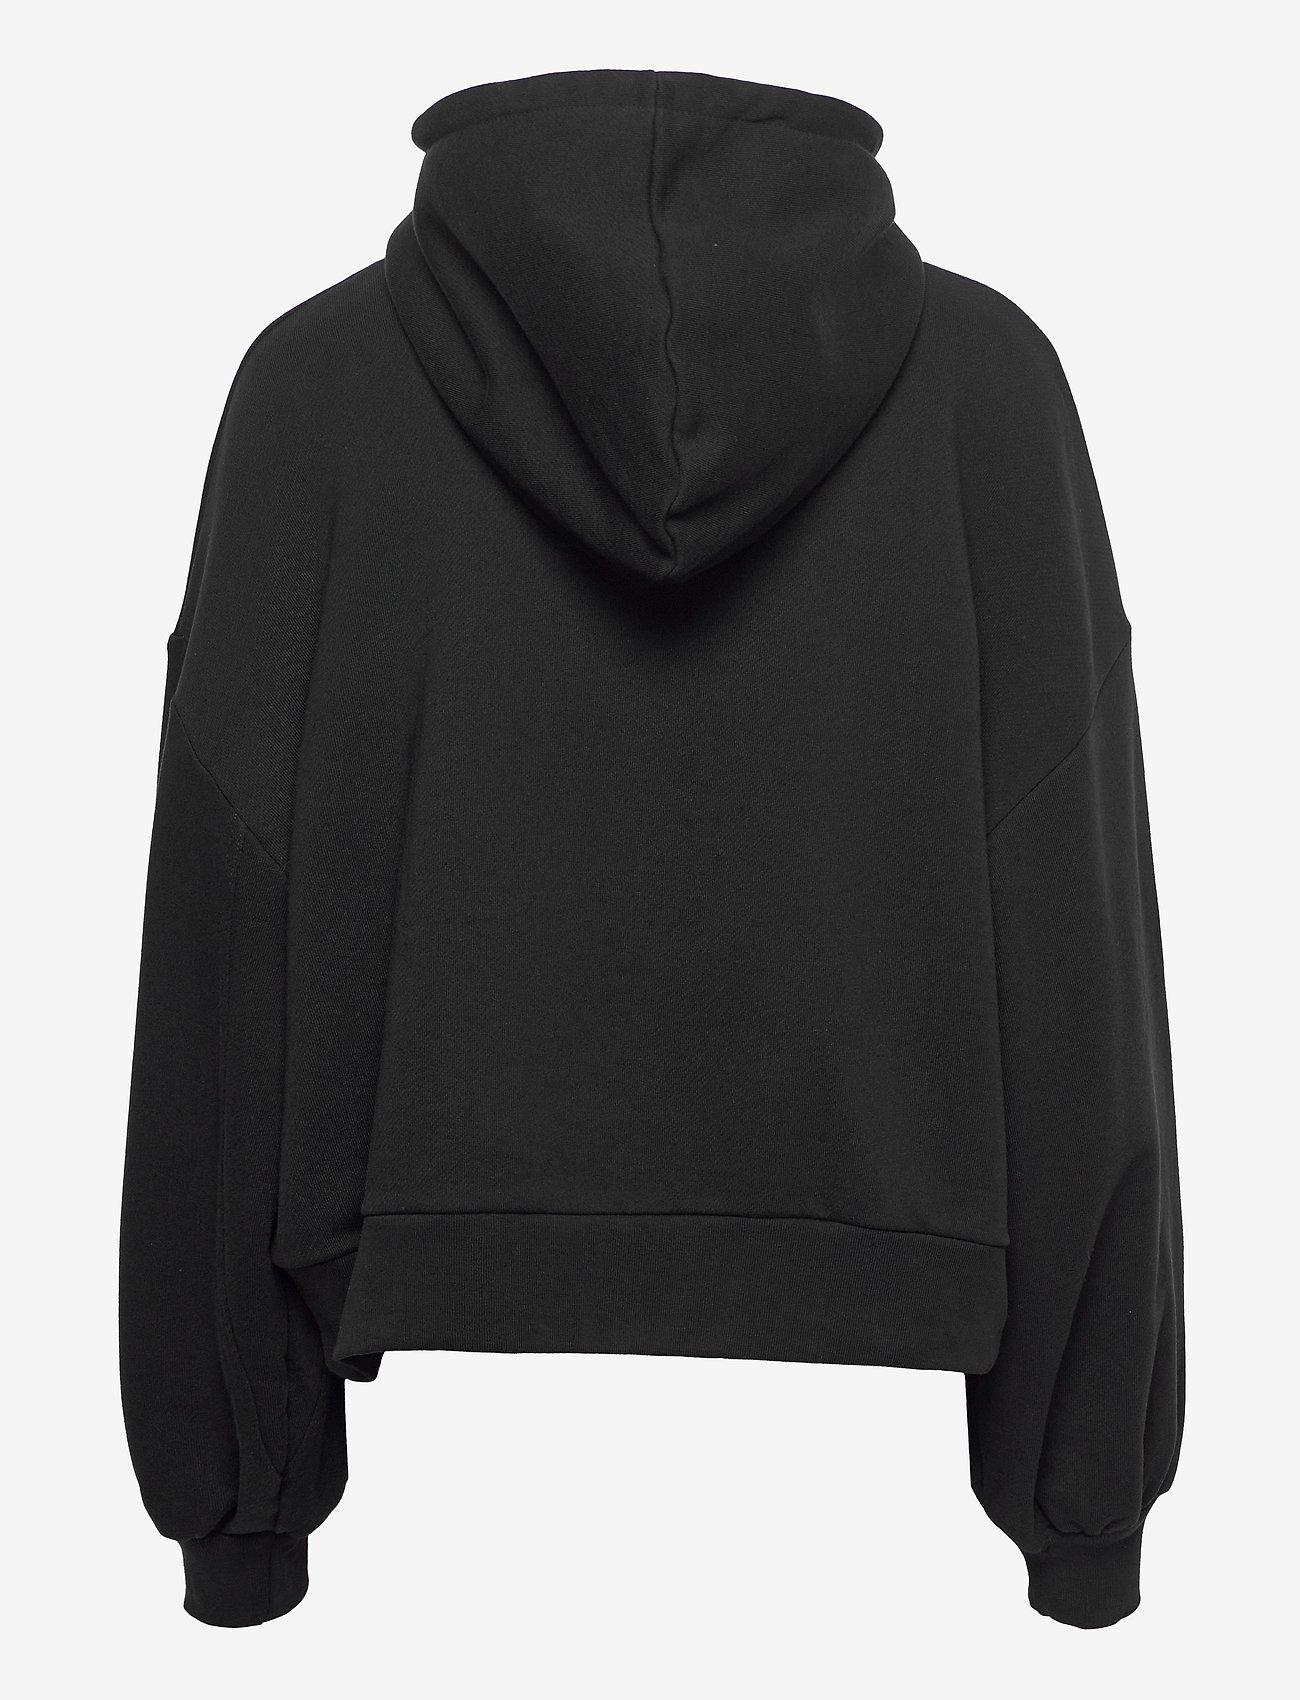 Pepe Jeans London - GRETA - hættetrøjer - black - 1